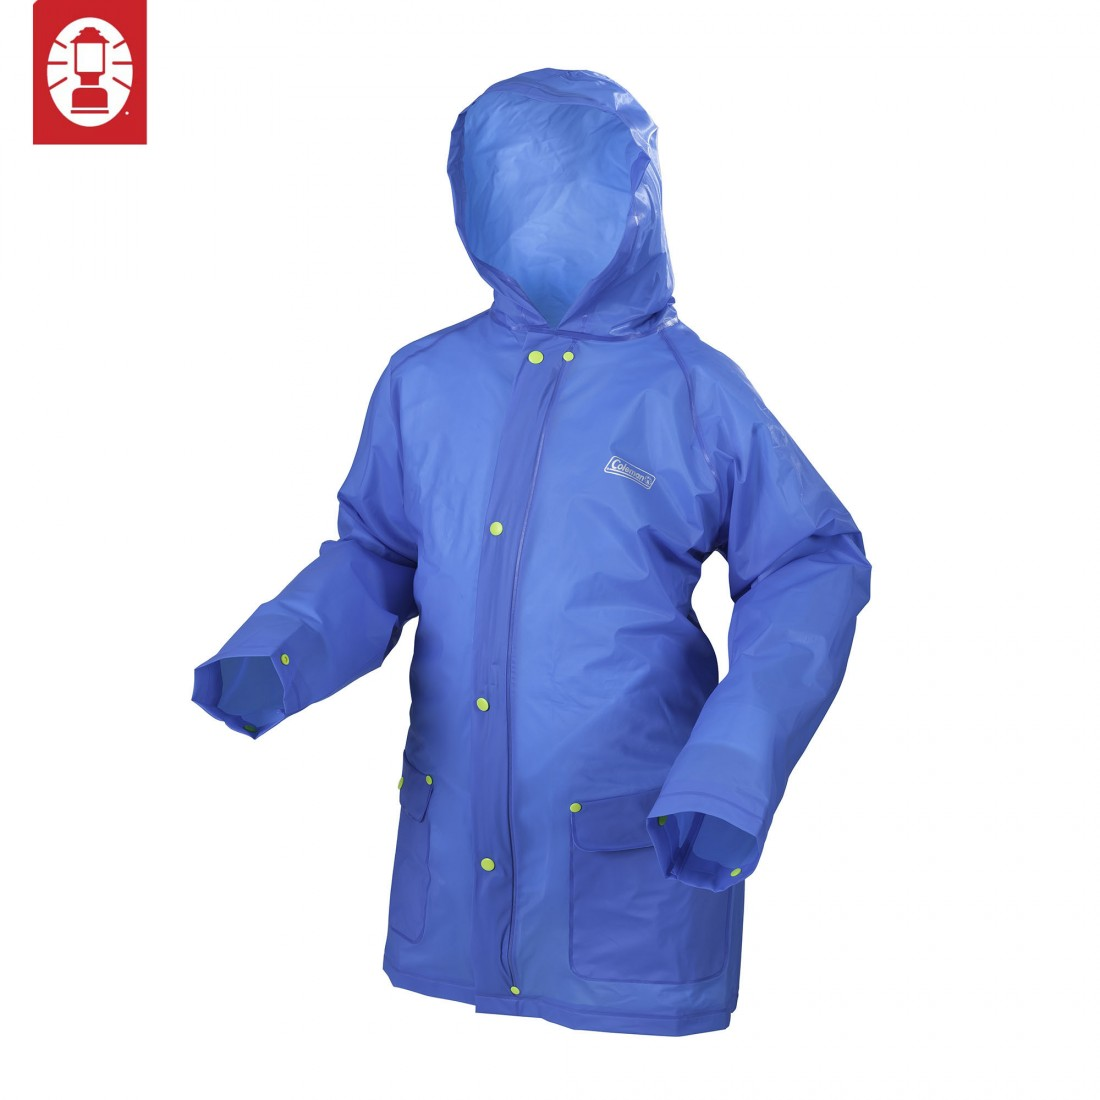 Coleman Youth Eva Rain Jacket (L/XL) - Blue